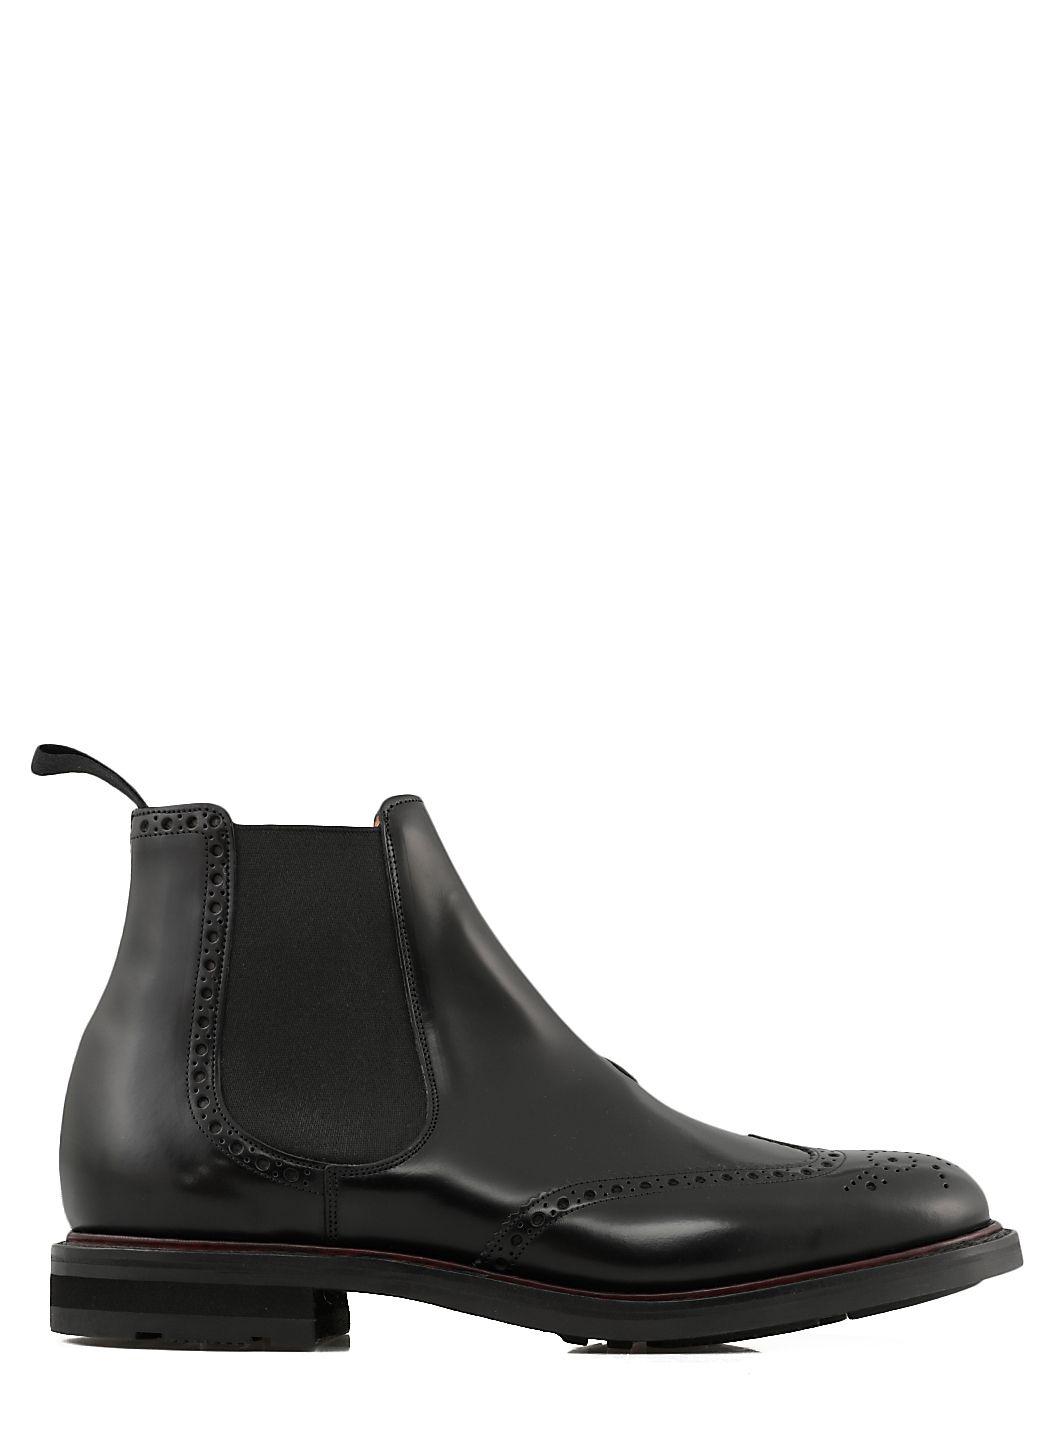 Coldbury chelsea boot